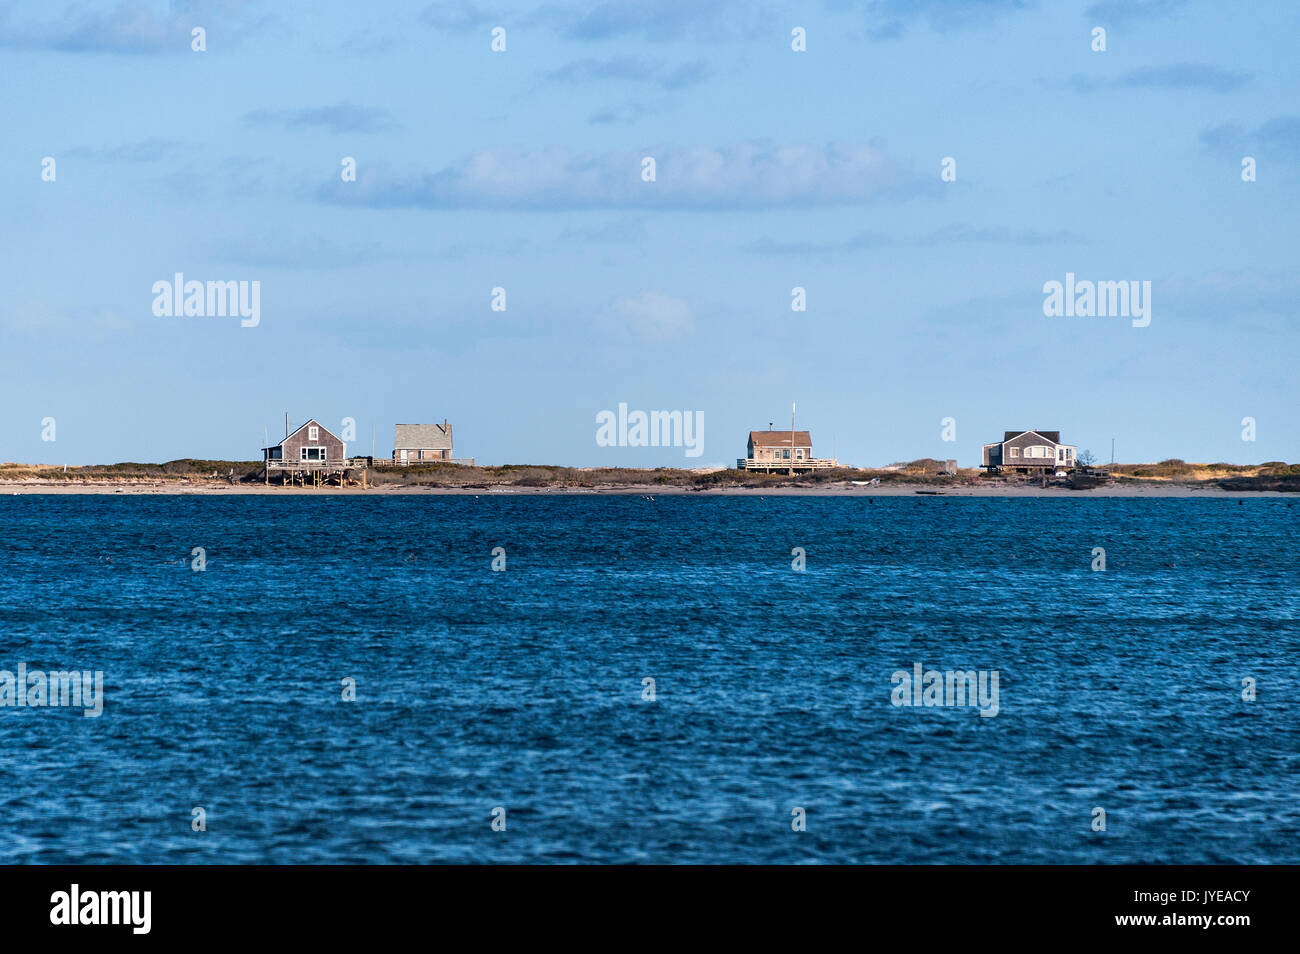 Remote beach cottages, Chatham, Cape Cod, Massachusetts, USA. - Stock Image